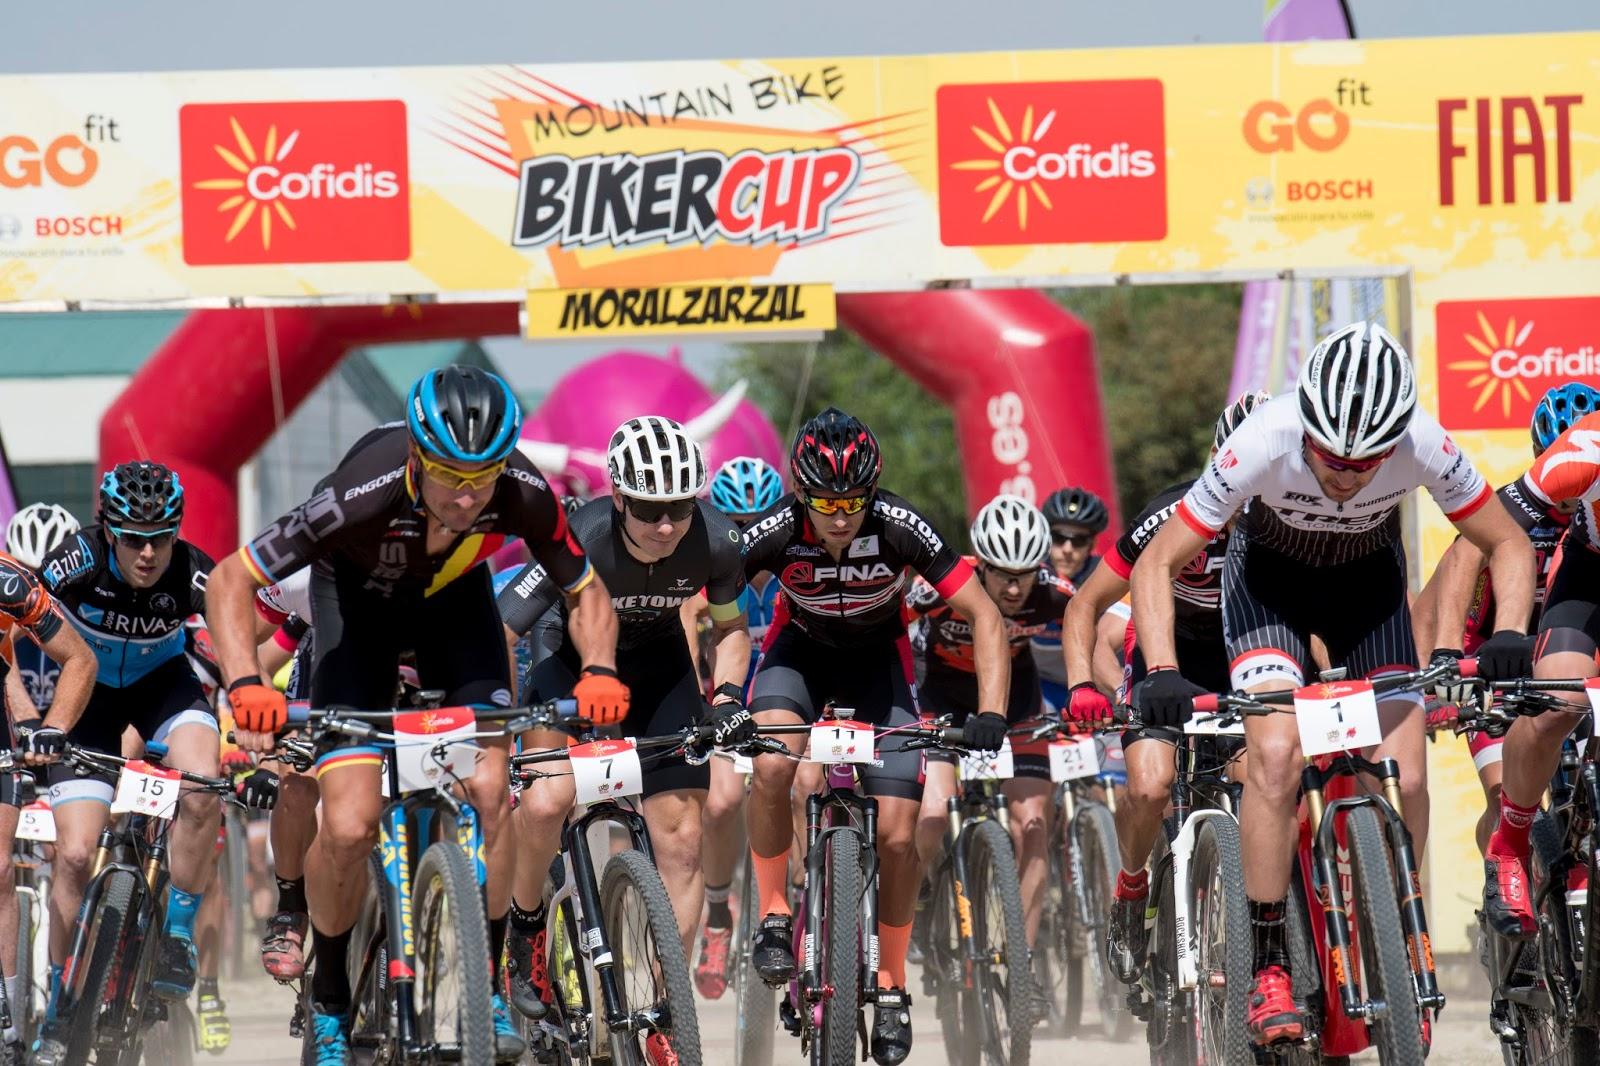 Circuito Xco Moralzarzal : Llega a españa la primera competición de bicicletas eléctricas mtb